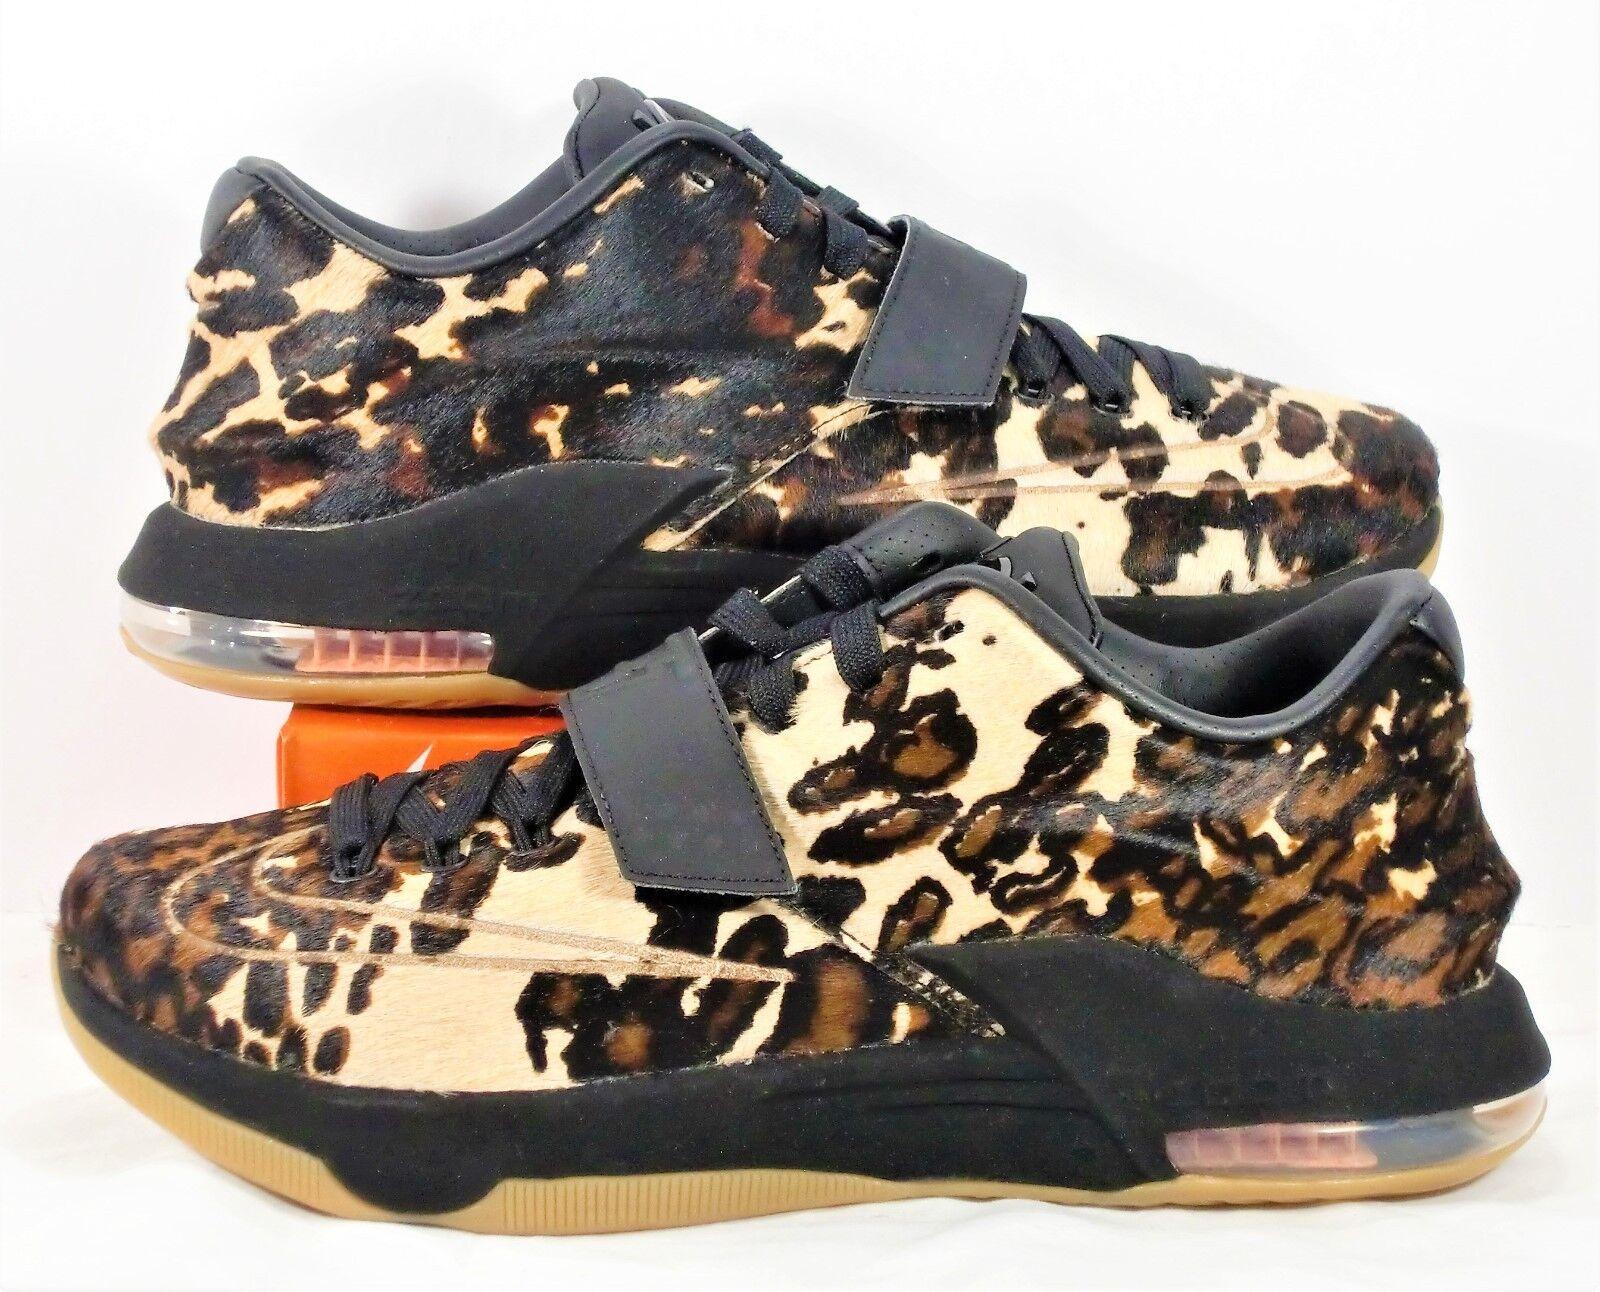 Nike kd 7 vii ext qs texas longhorn stato nero & vela sz nuovi 716654 001